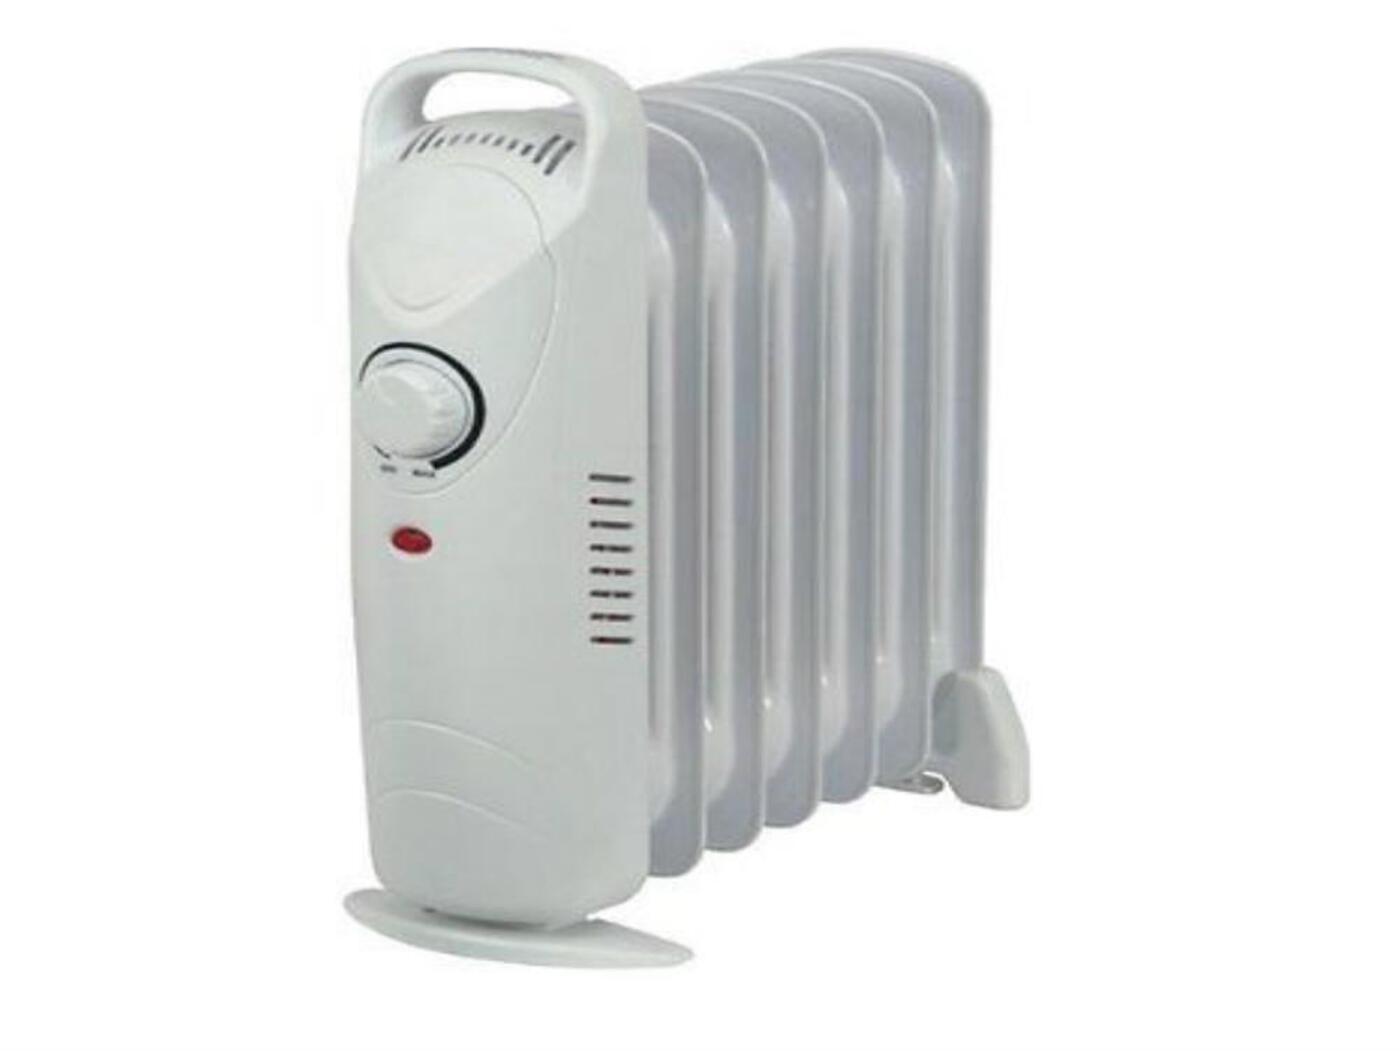 Kingavon Mini Oil Filled 7 Fin 600w Radiator Heater